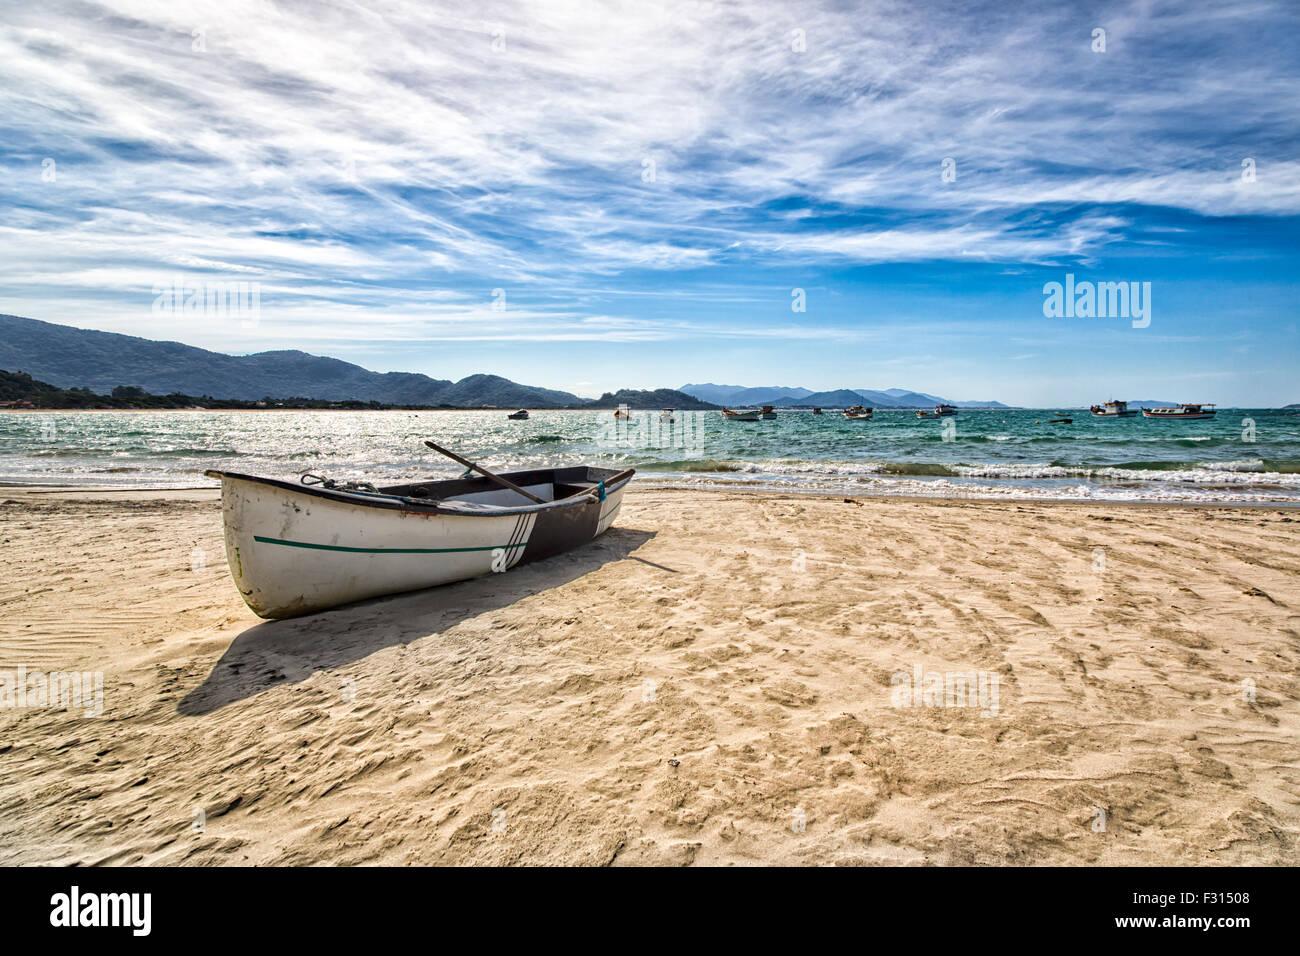 Beautiful landscape in Florianopolis, Santa Catarina, Brazil. One of the main tourists destination in south region. - Stock Image